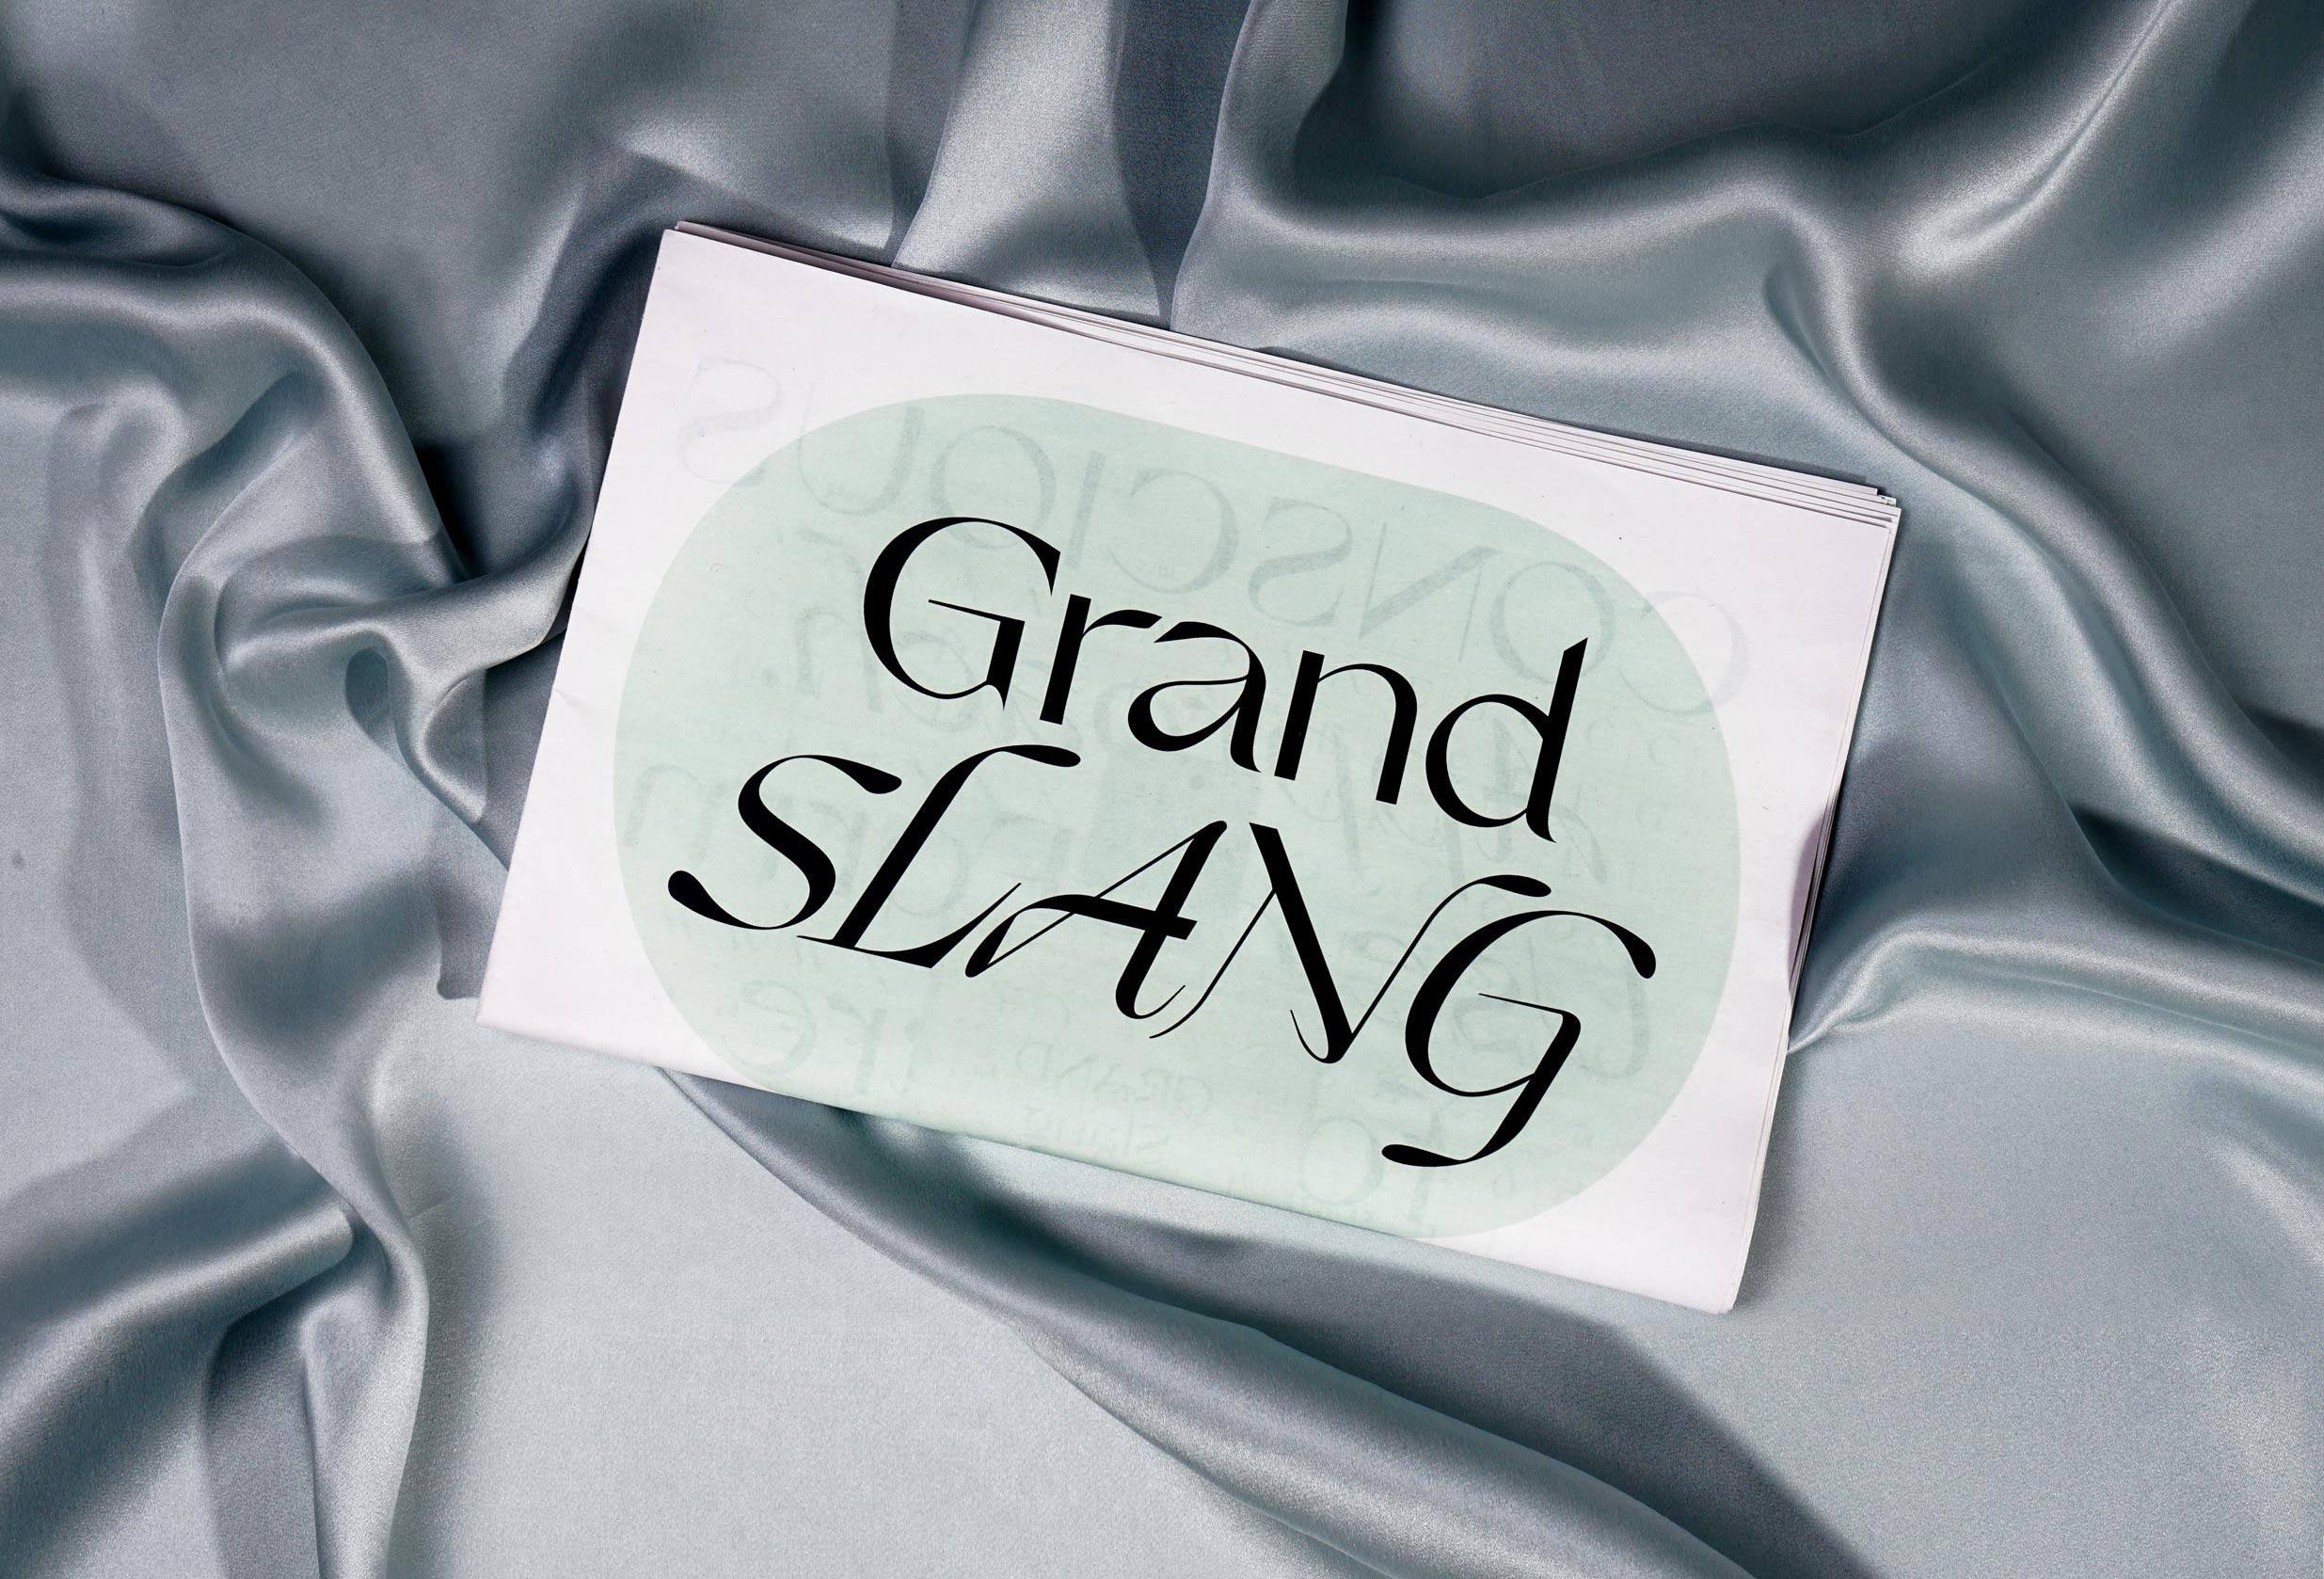 Grand Slang